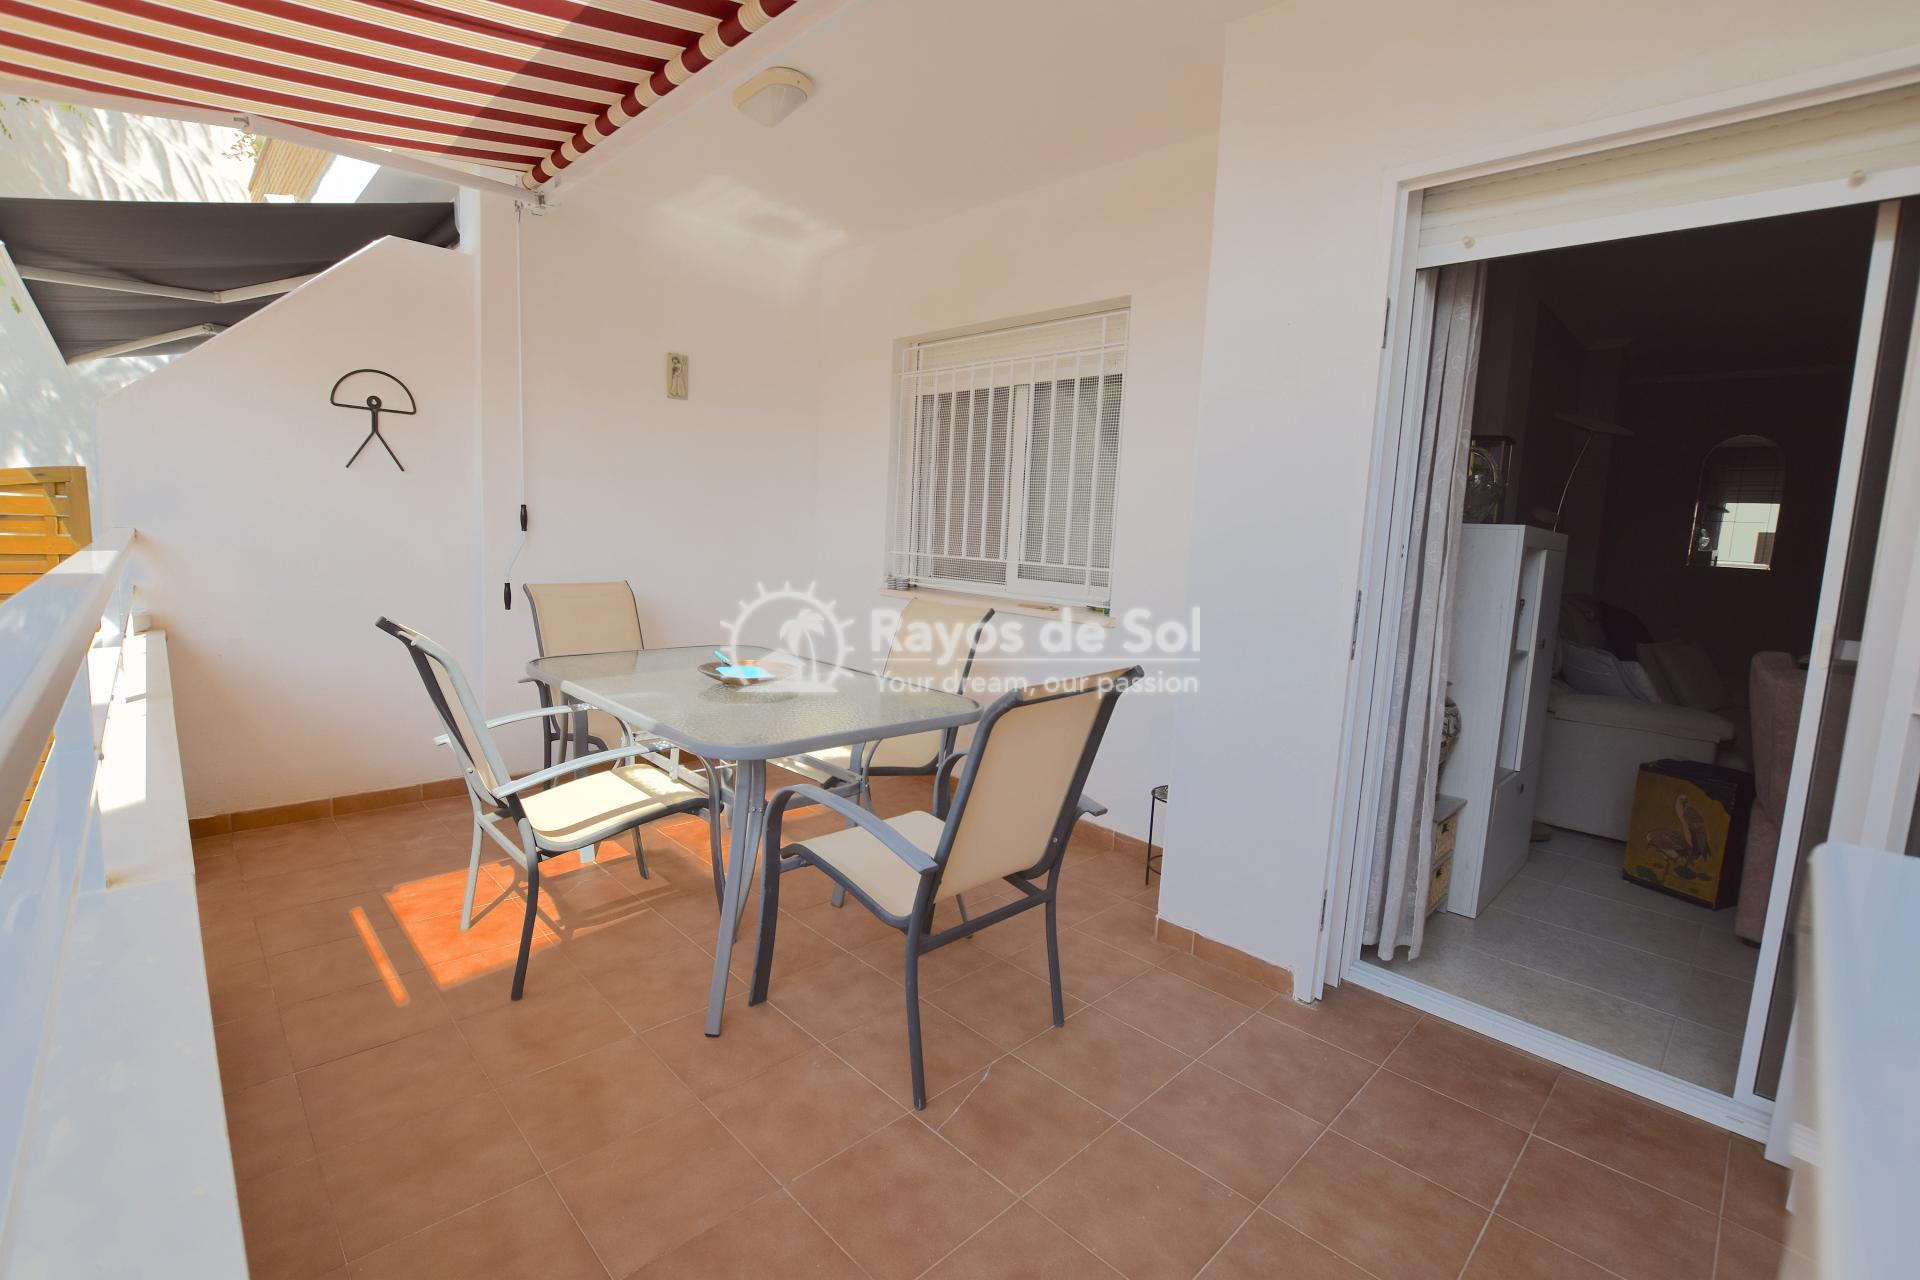 Appartement met zuidwest oriëntatie  in San Cayetano, Costa Cálida (SCRE0055) - 20